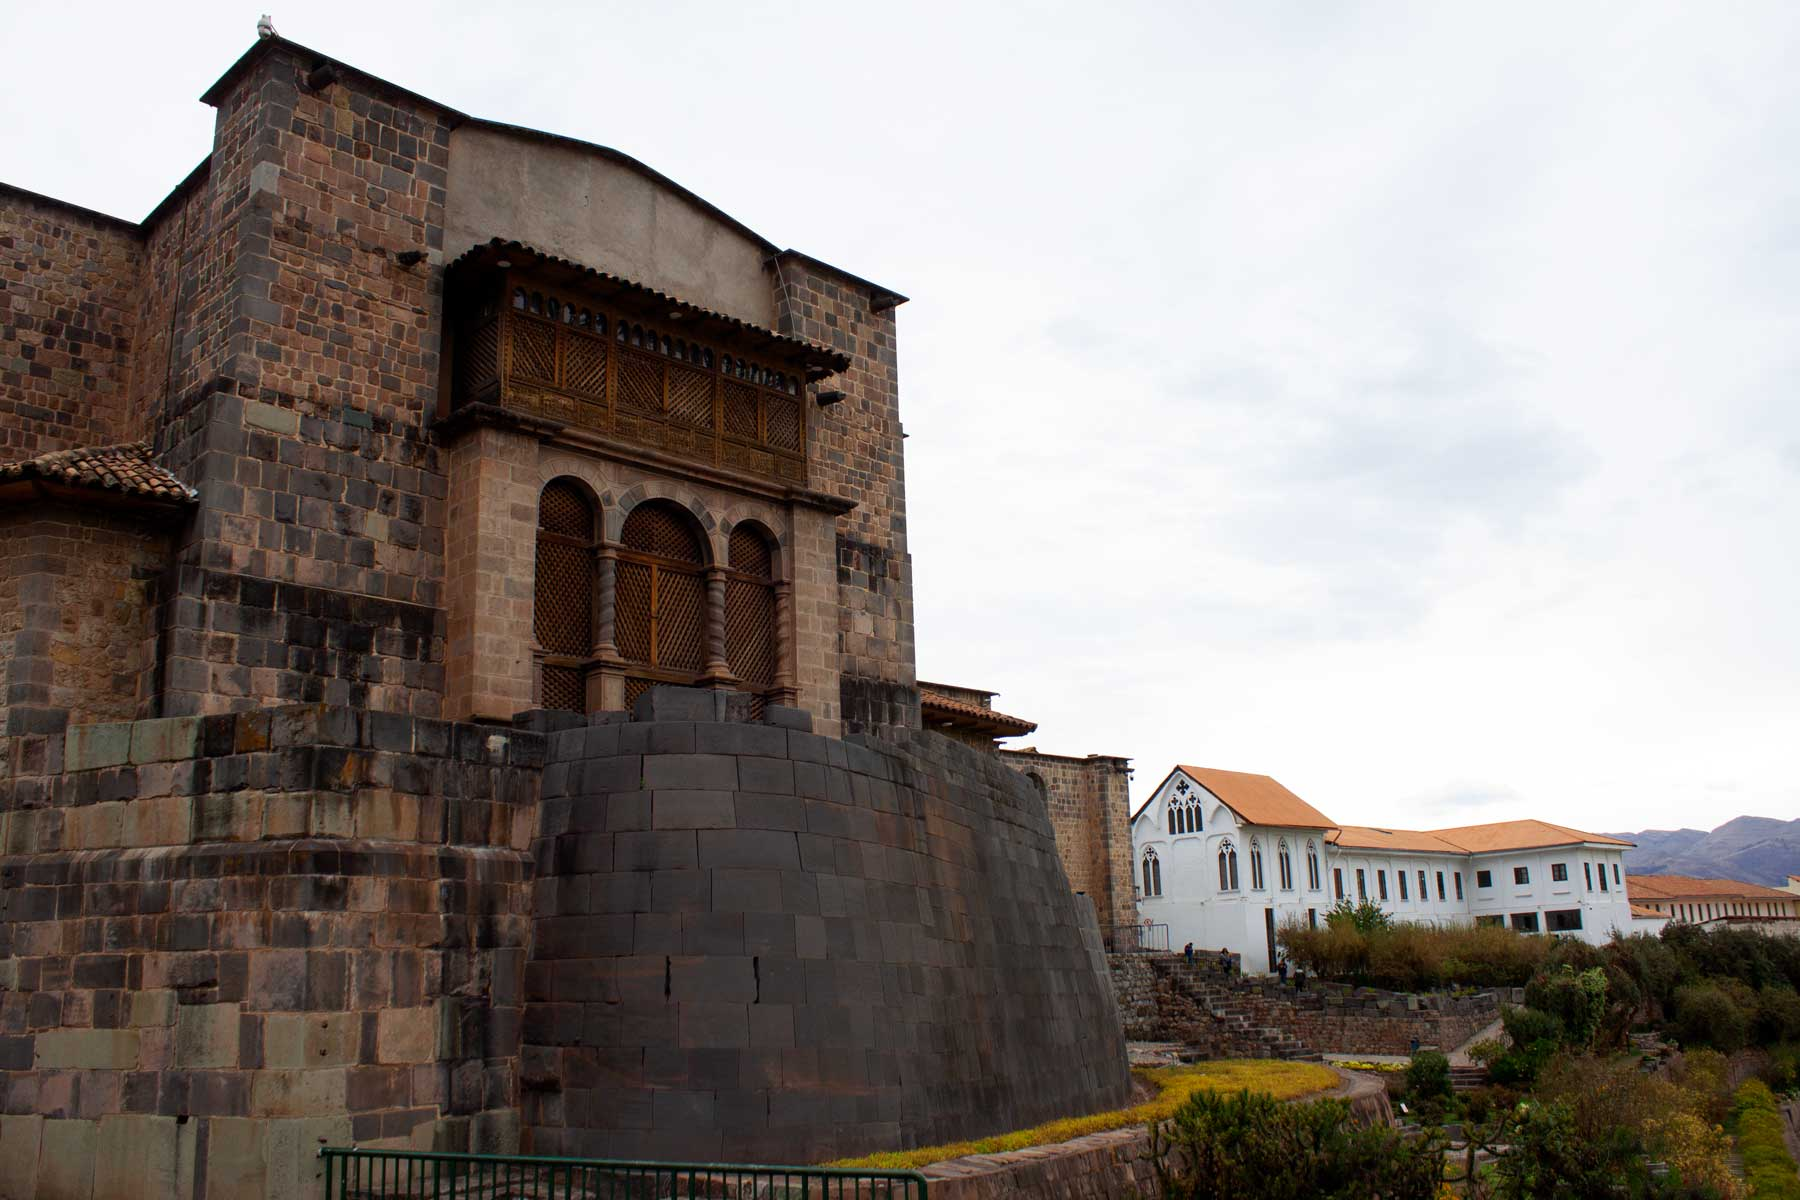 The Qoricancha